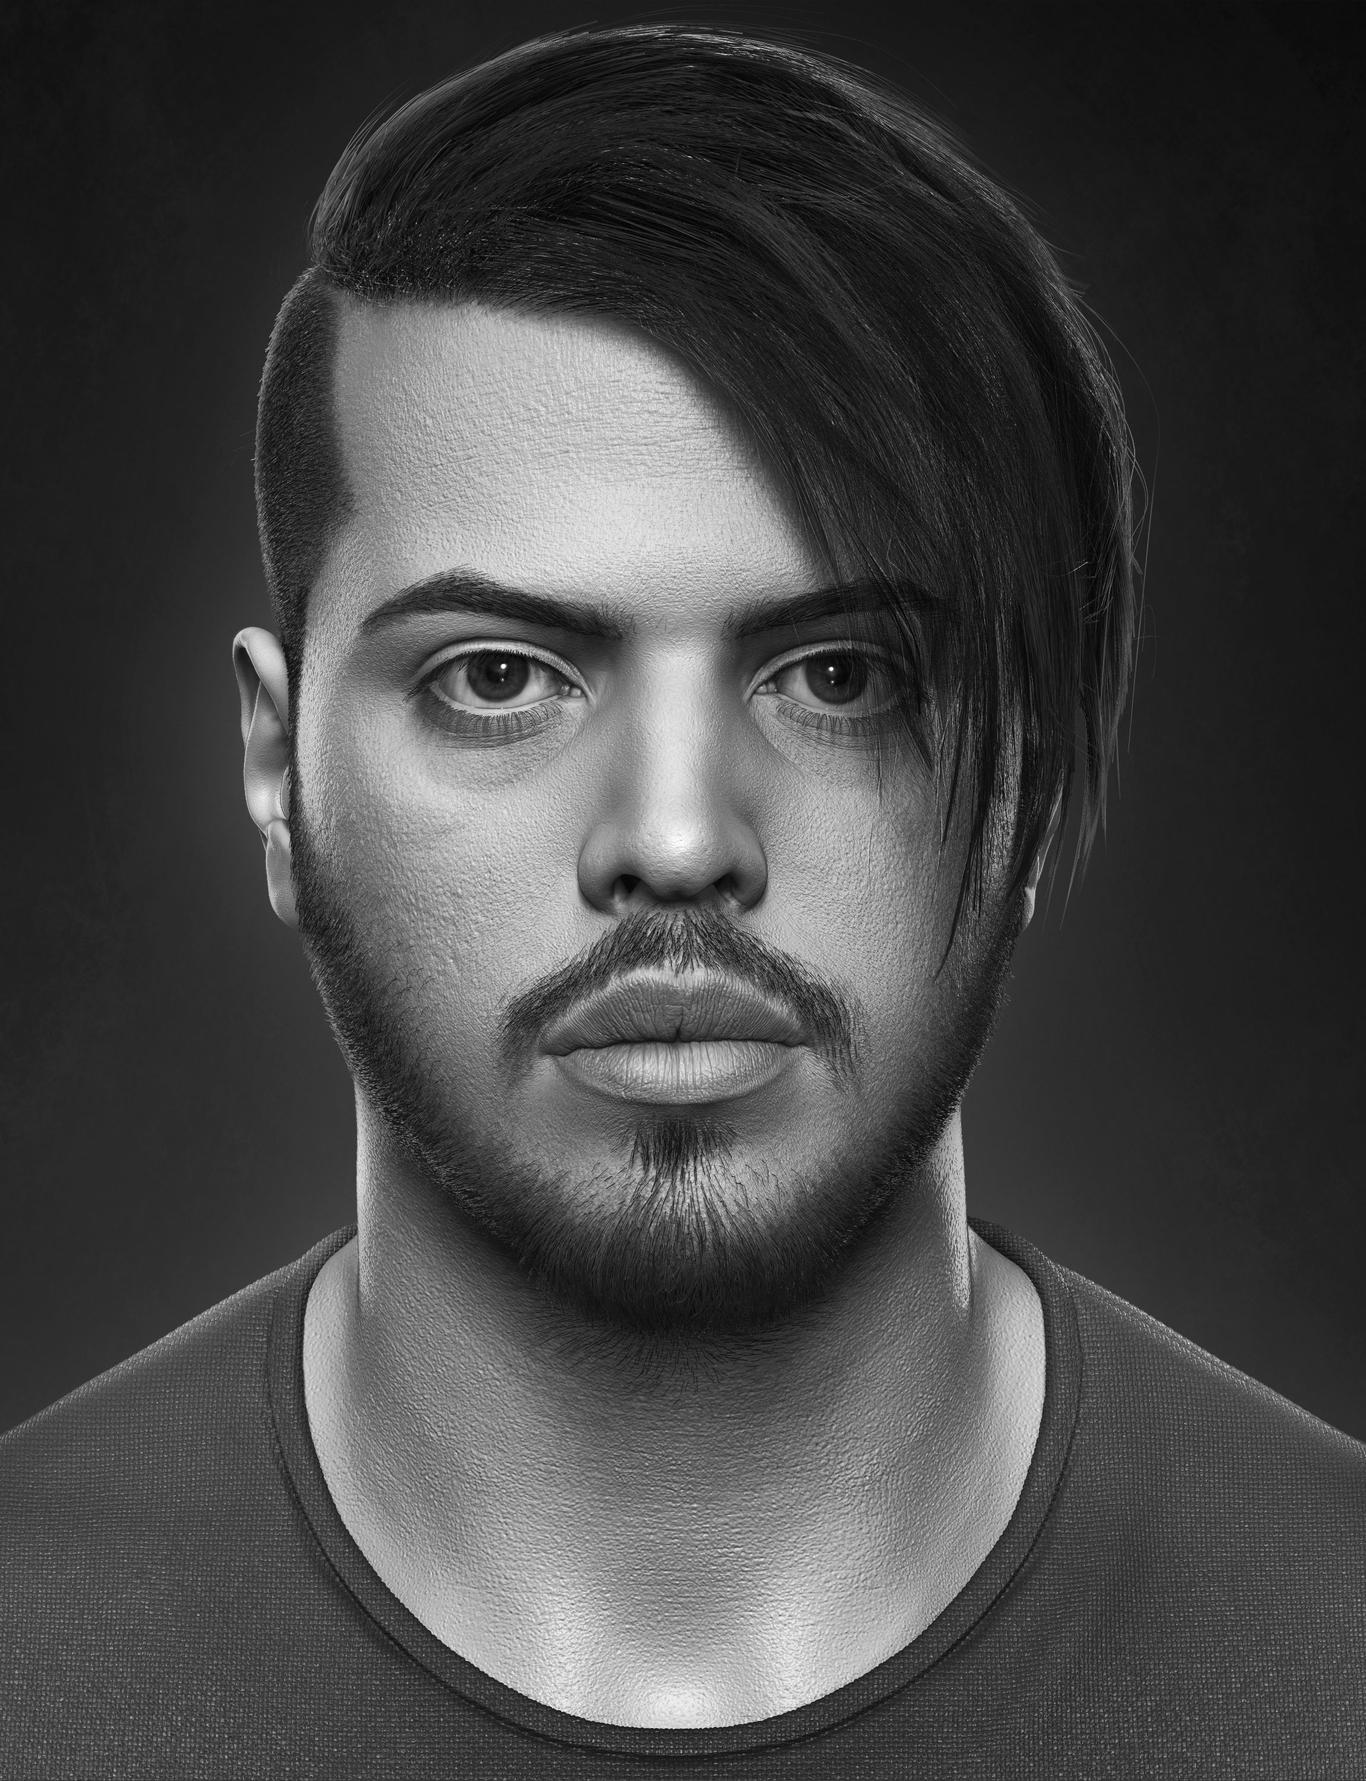 Hosseindiba self portrait wip 1 a80cdab6 tner